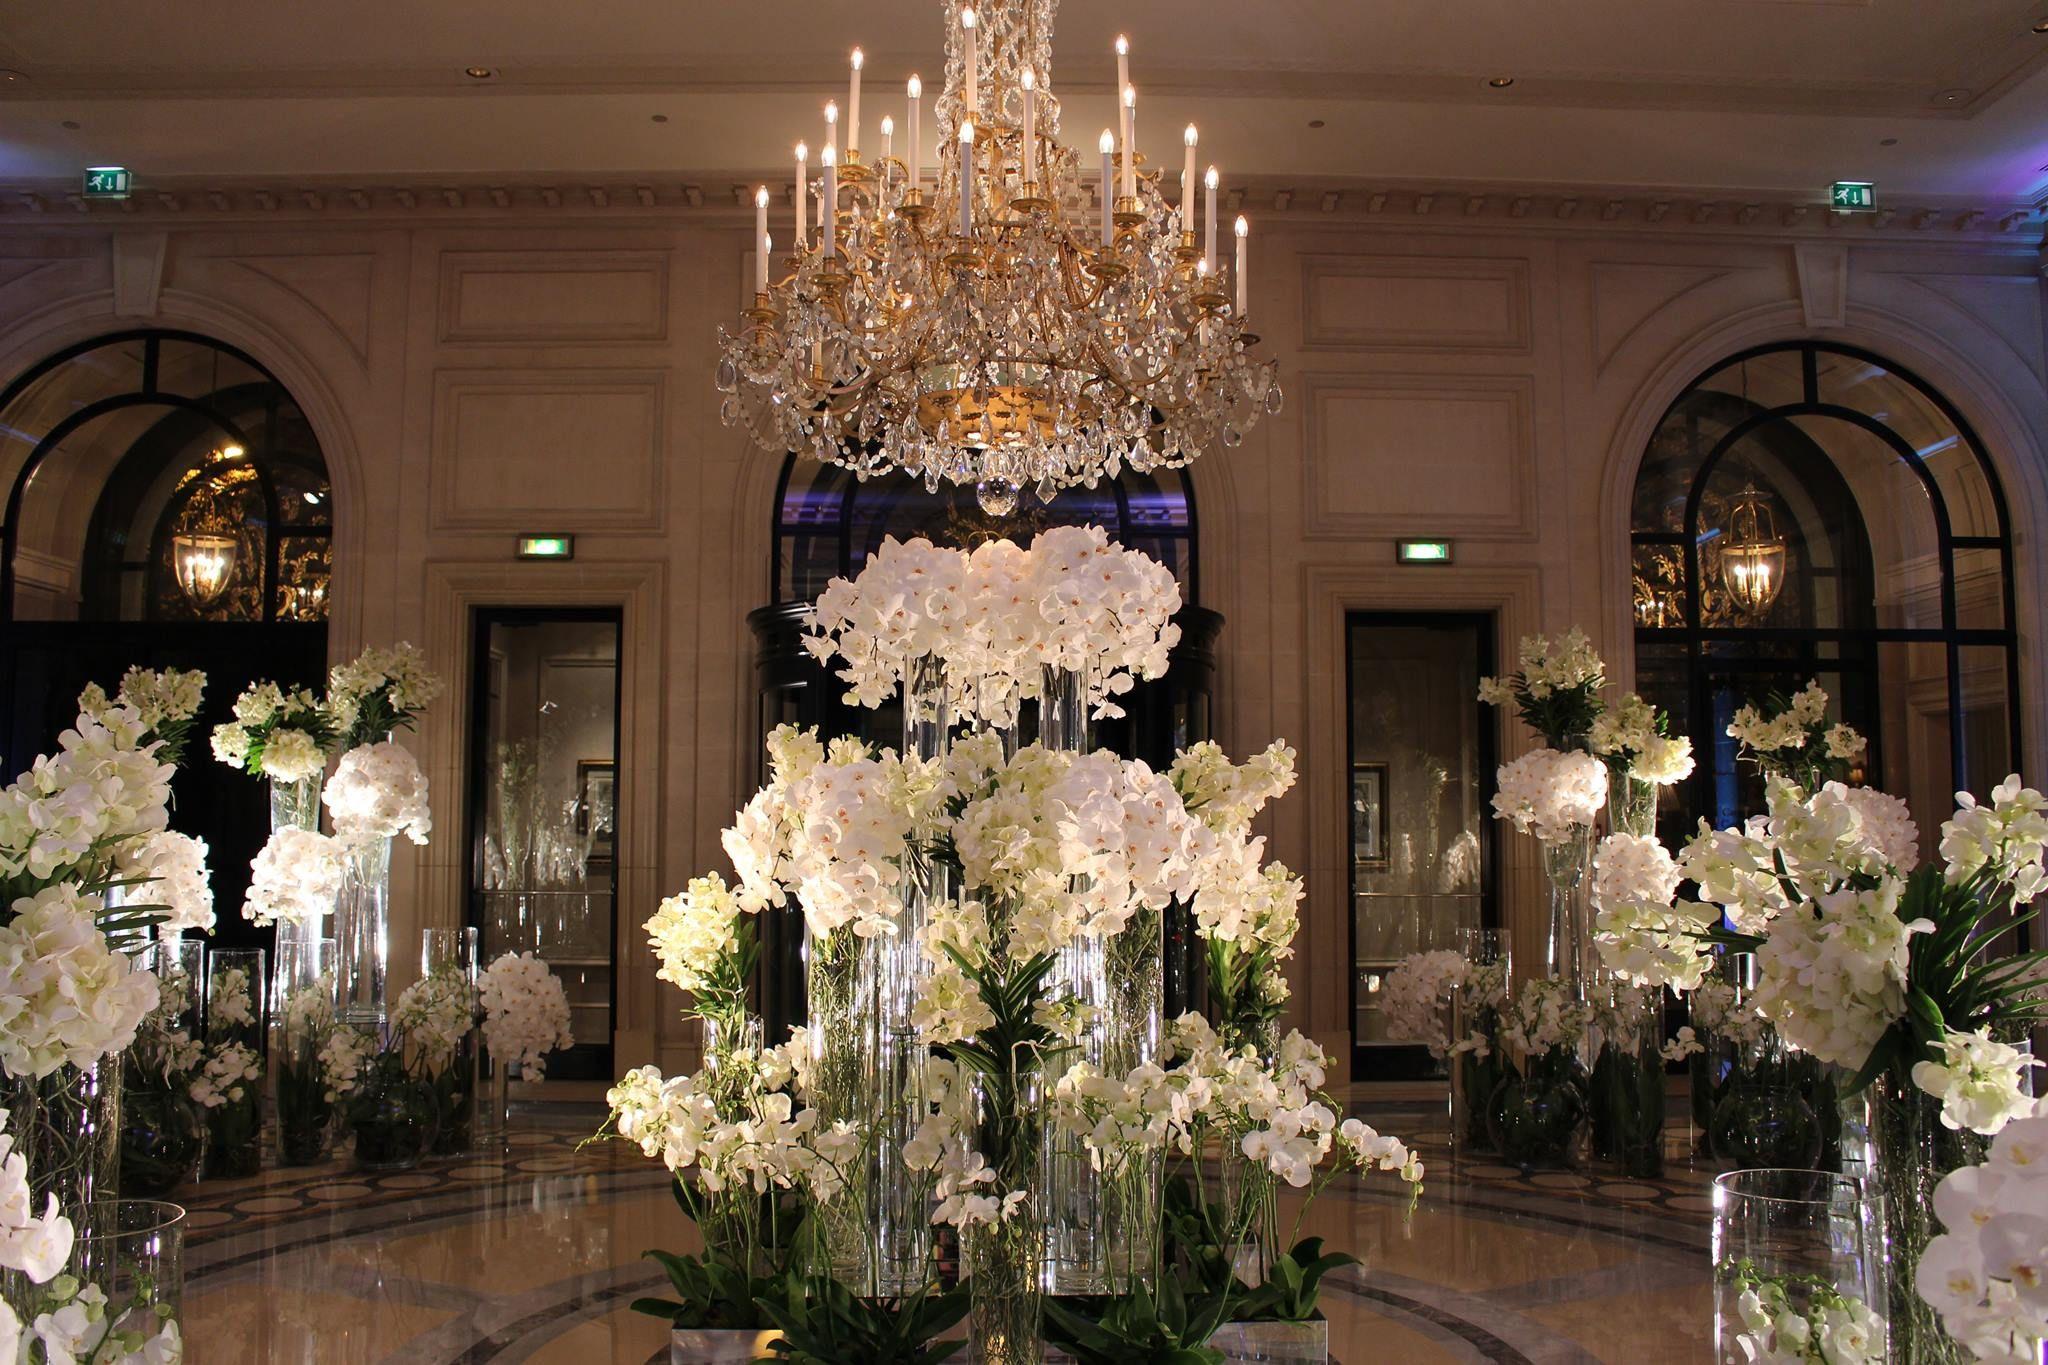 The flower arrangements at the George V